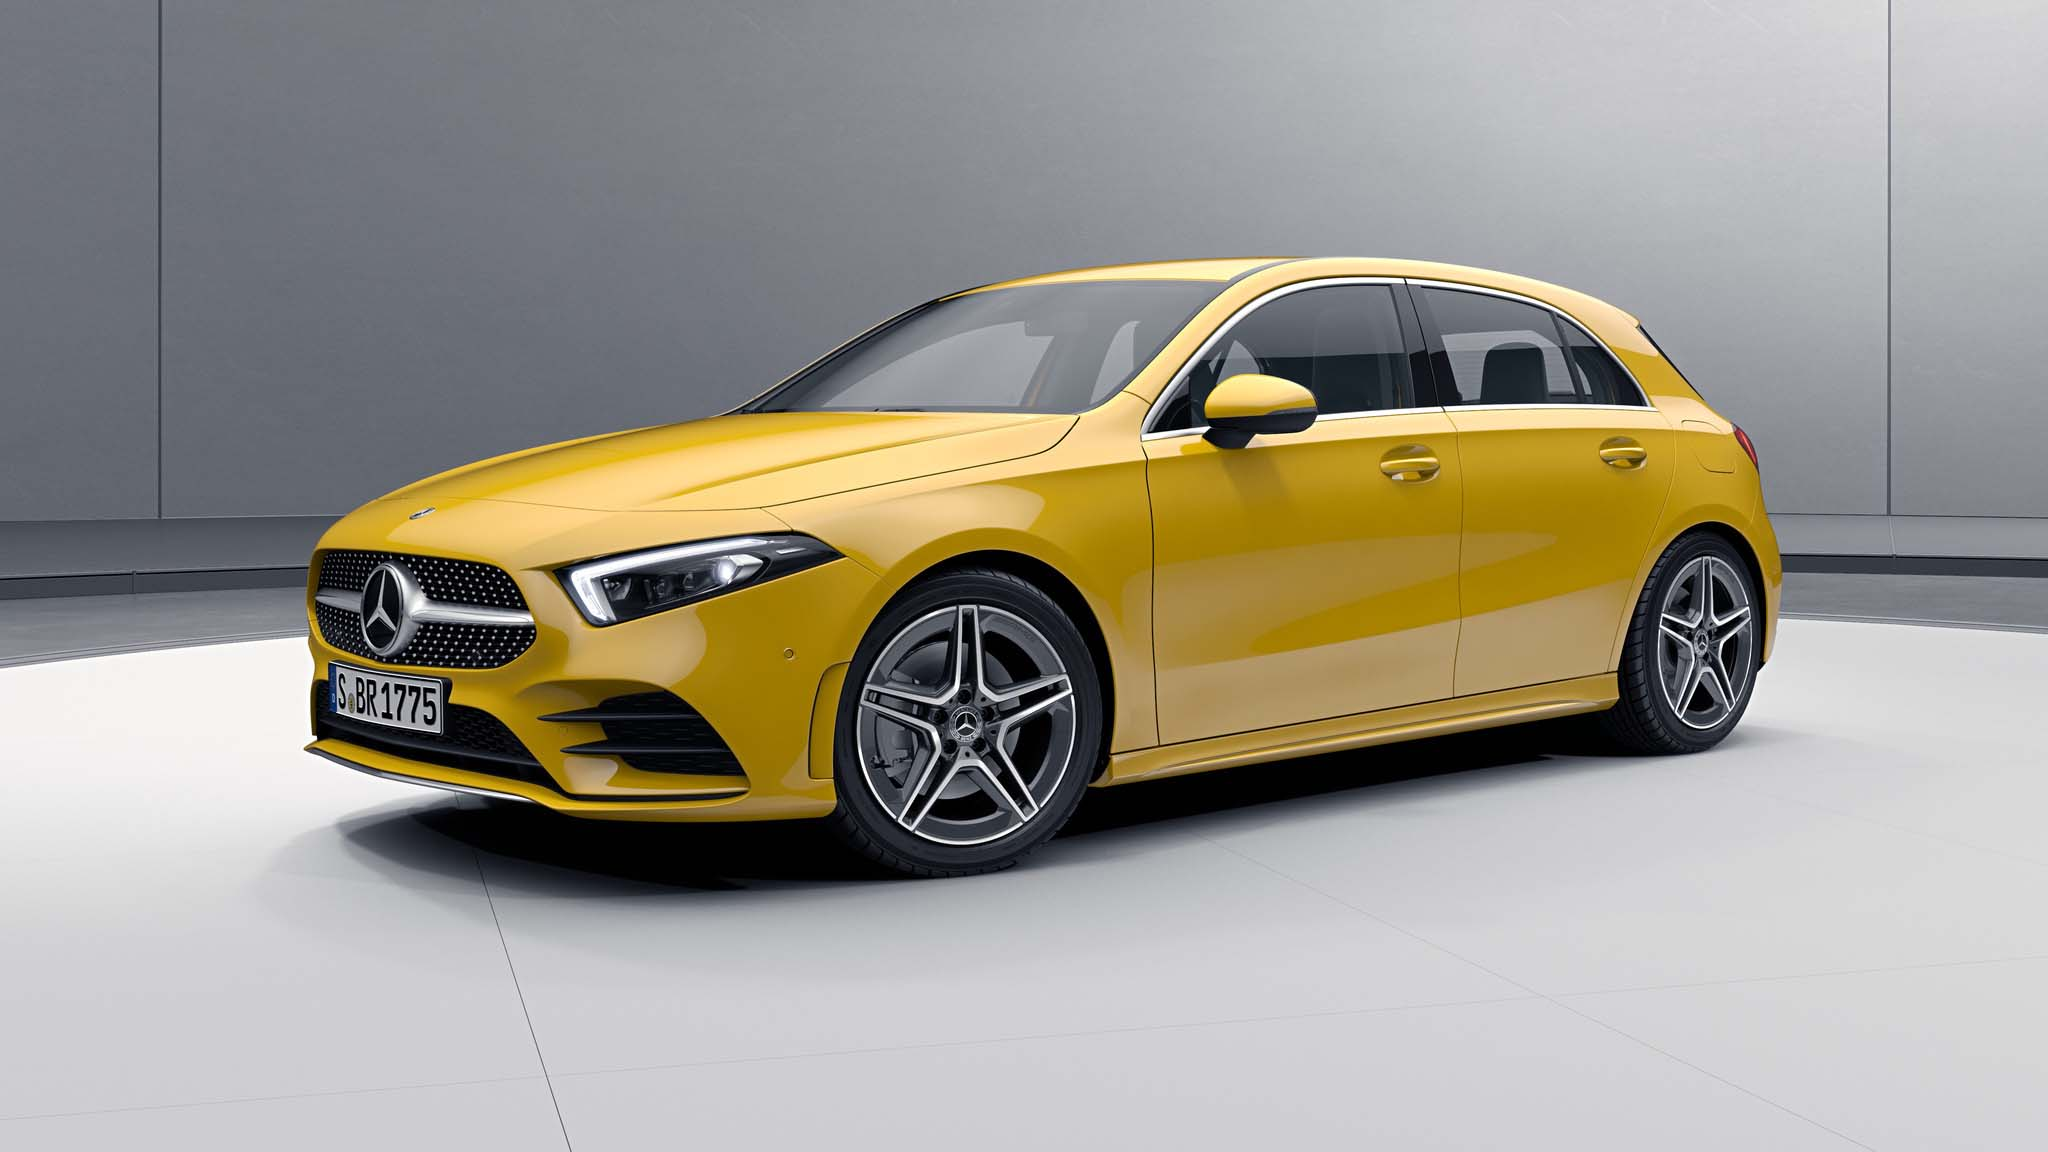 Vue de trois quarts de profil de la Mercedes Classe A avec la peinture standard jaune soleil